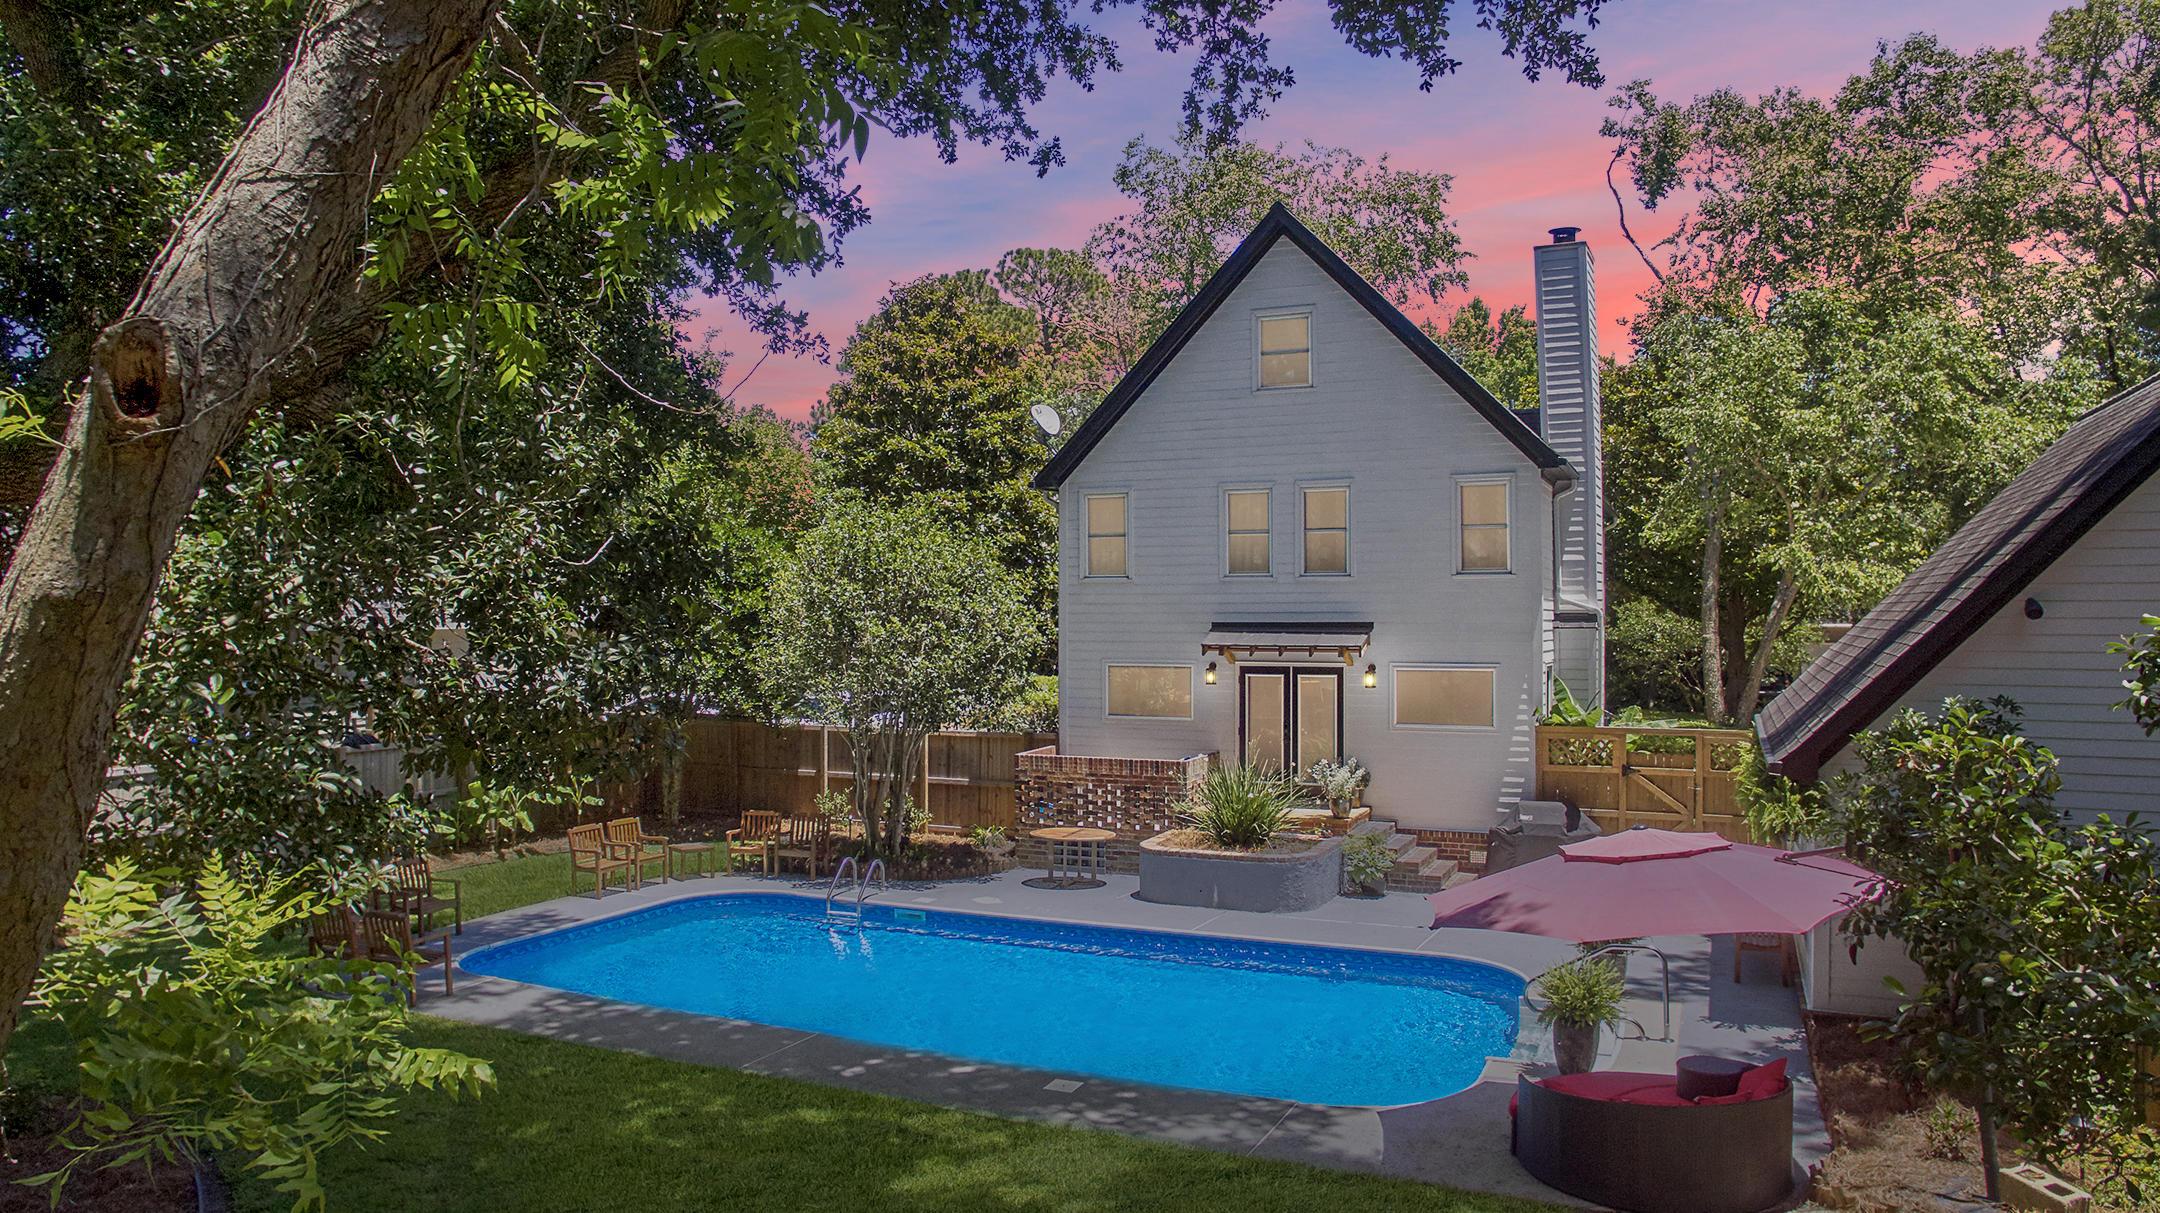 Stiles Point Plantation Homes For Sale - 699 Castle Pinckney, Charleston, SC - 3